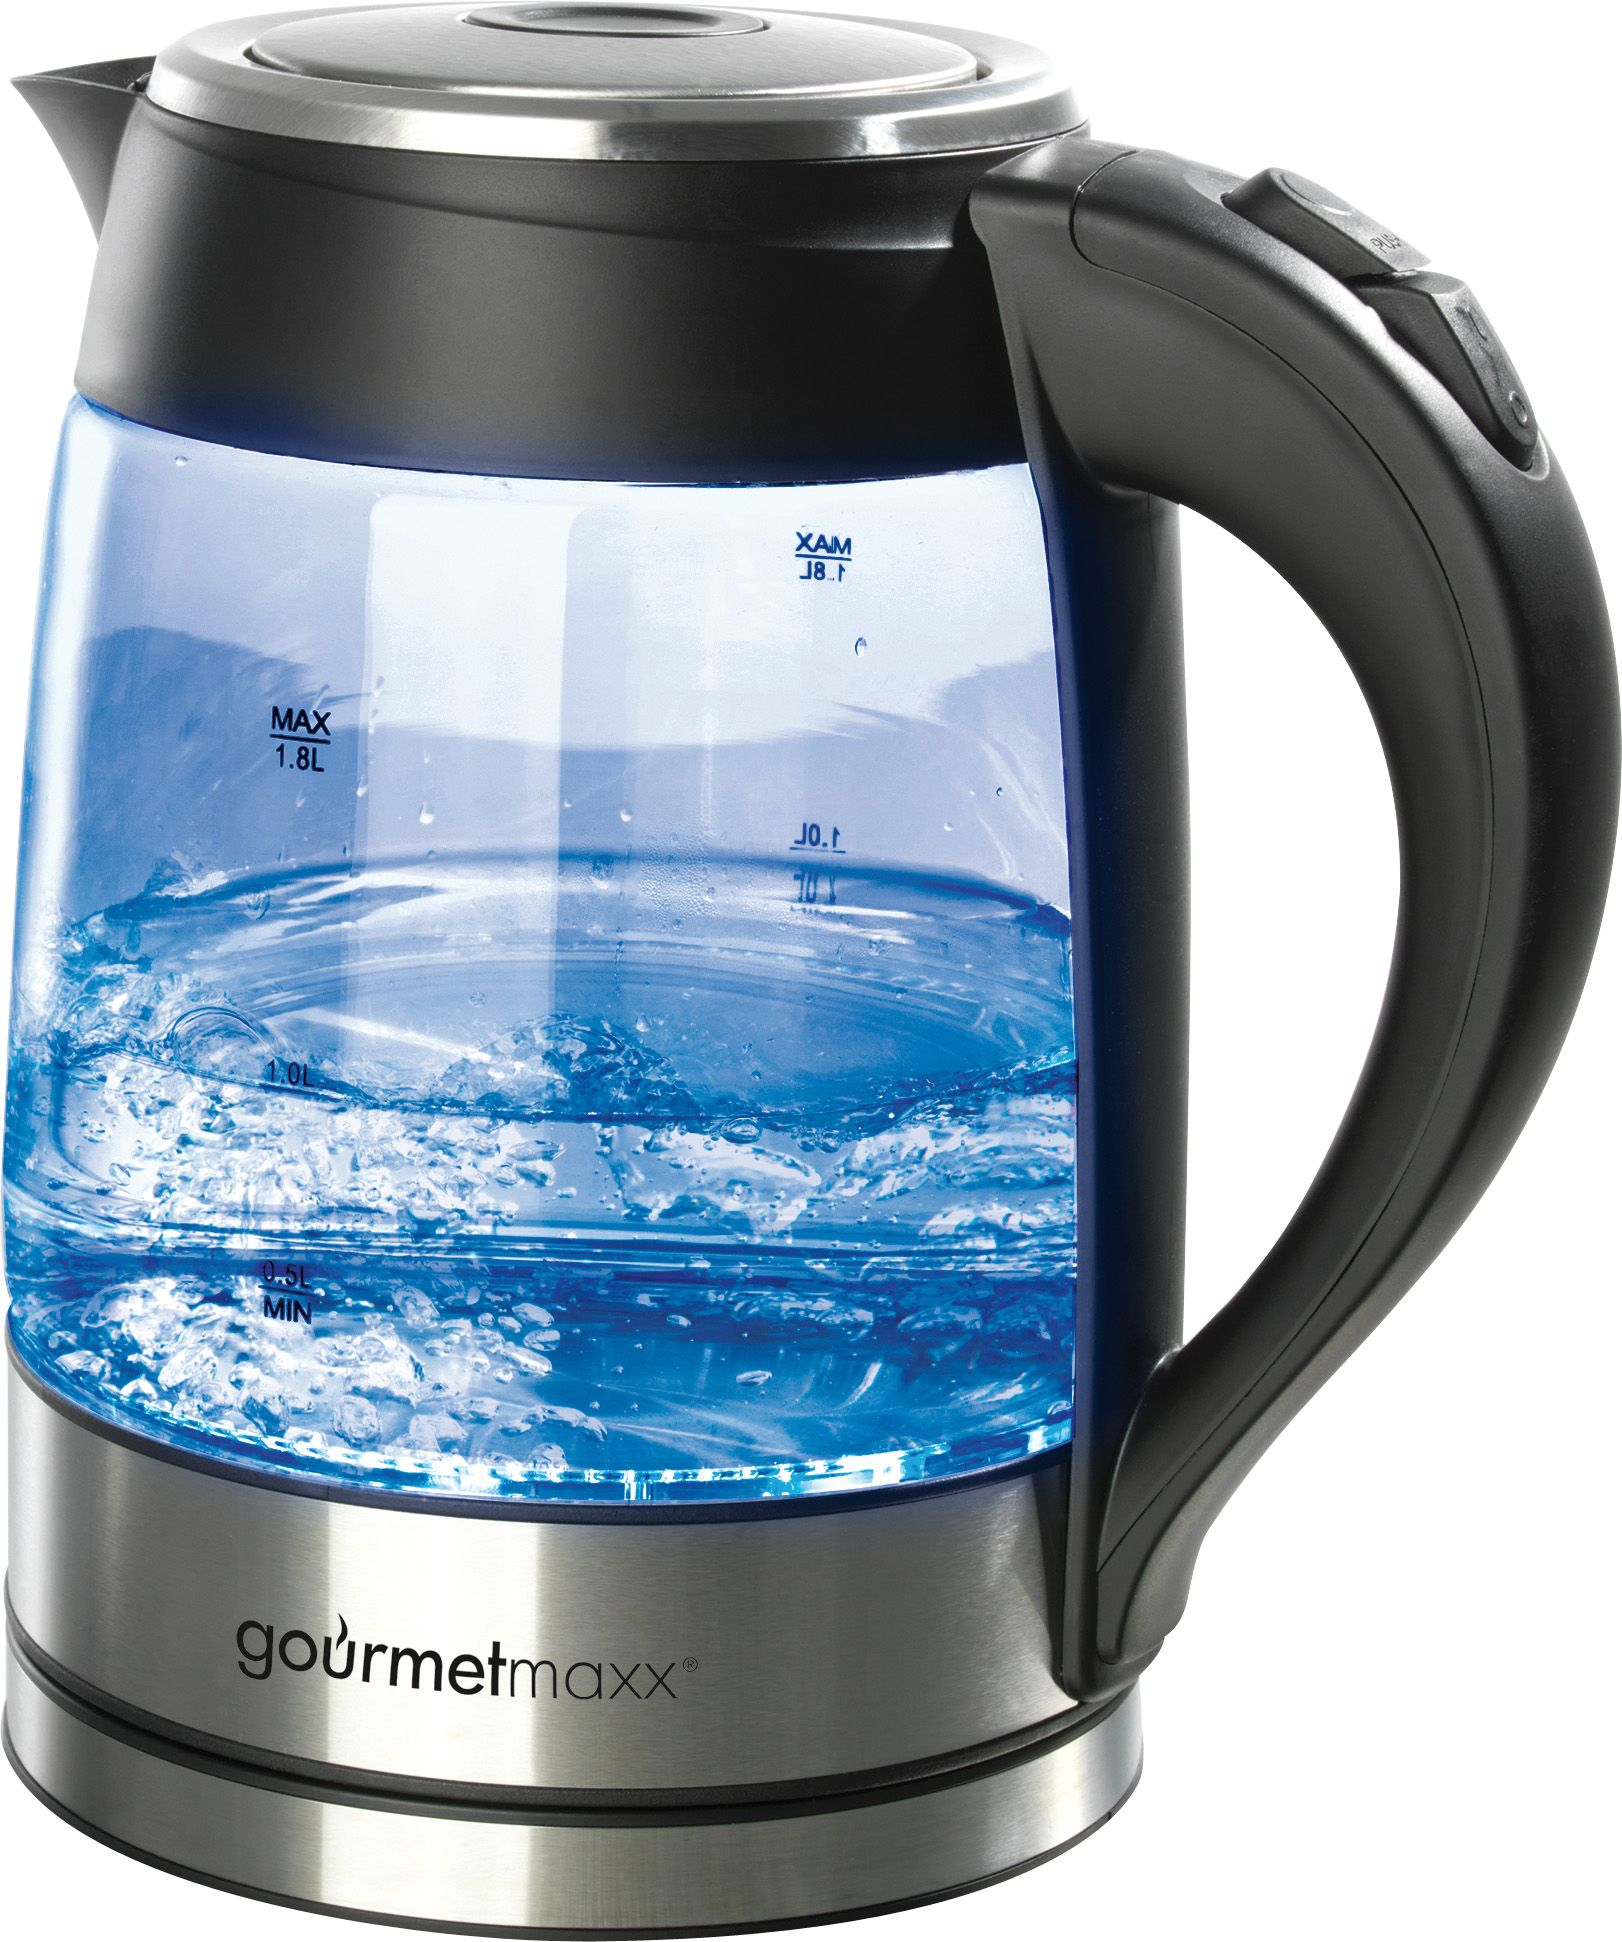 GOURMETMAXX gourmetmaxx LED Glas-Wasserkocher, 1,8 Liter, 2200 Watt, schwarz